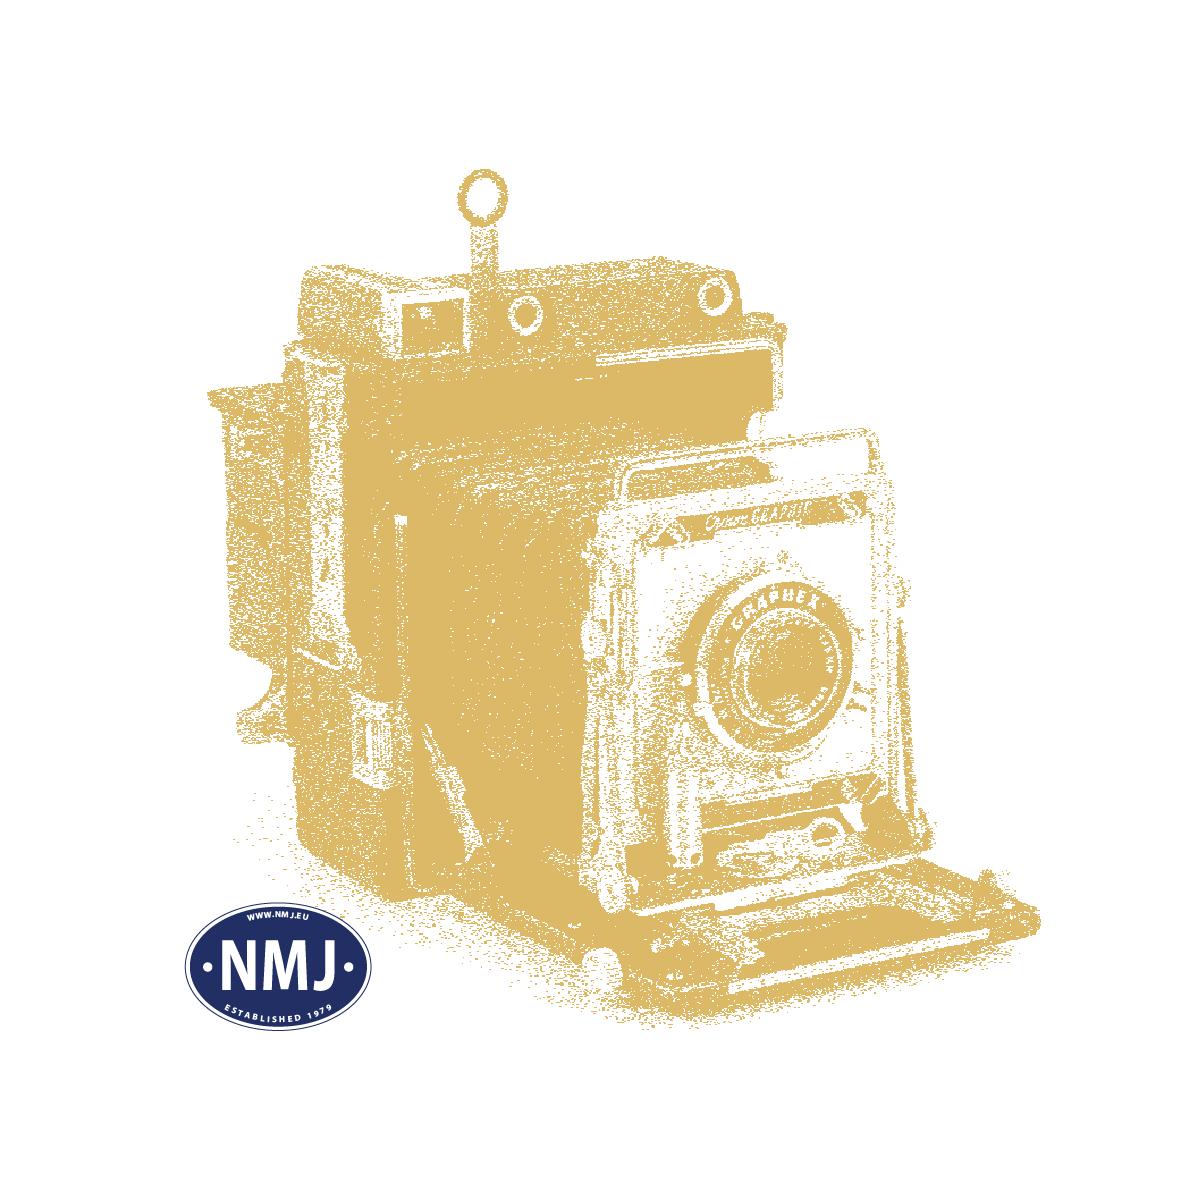 NMJT9912 - Speil og Stige for Rødbrun El13